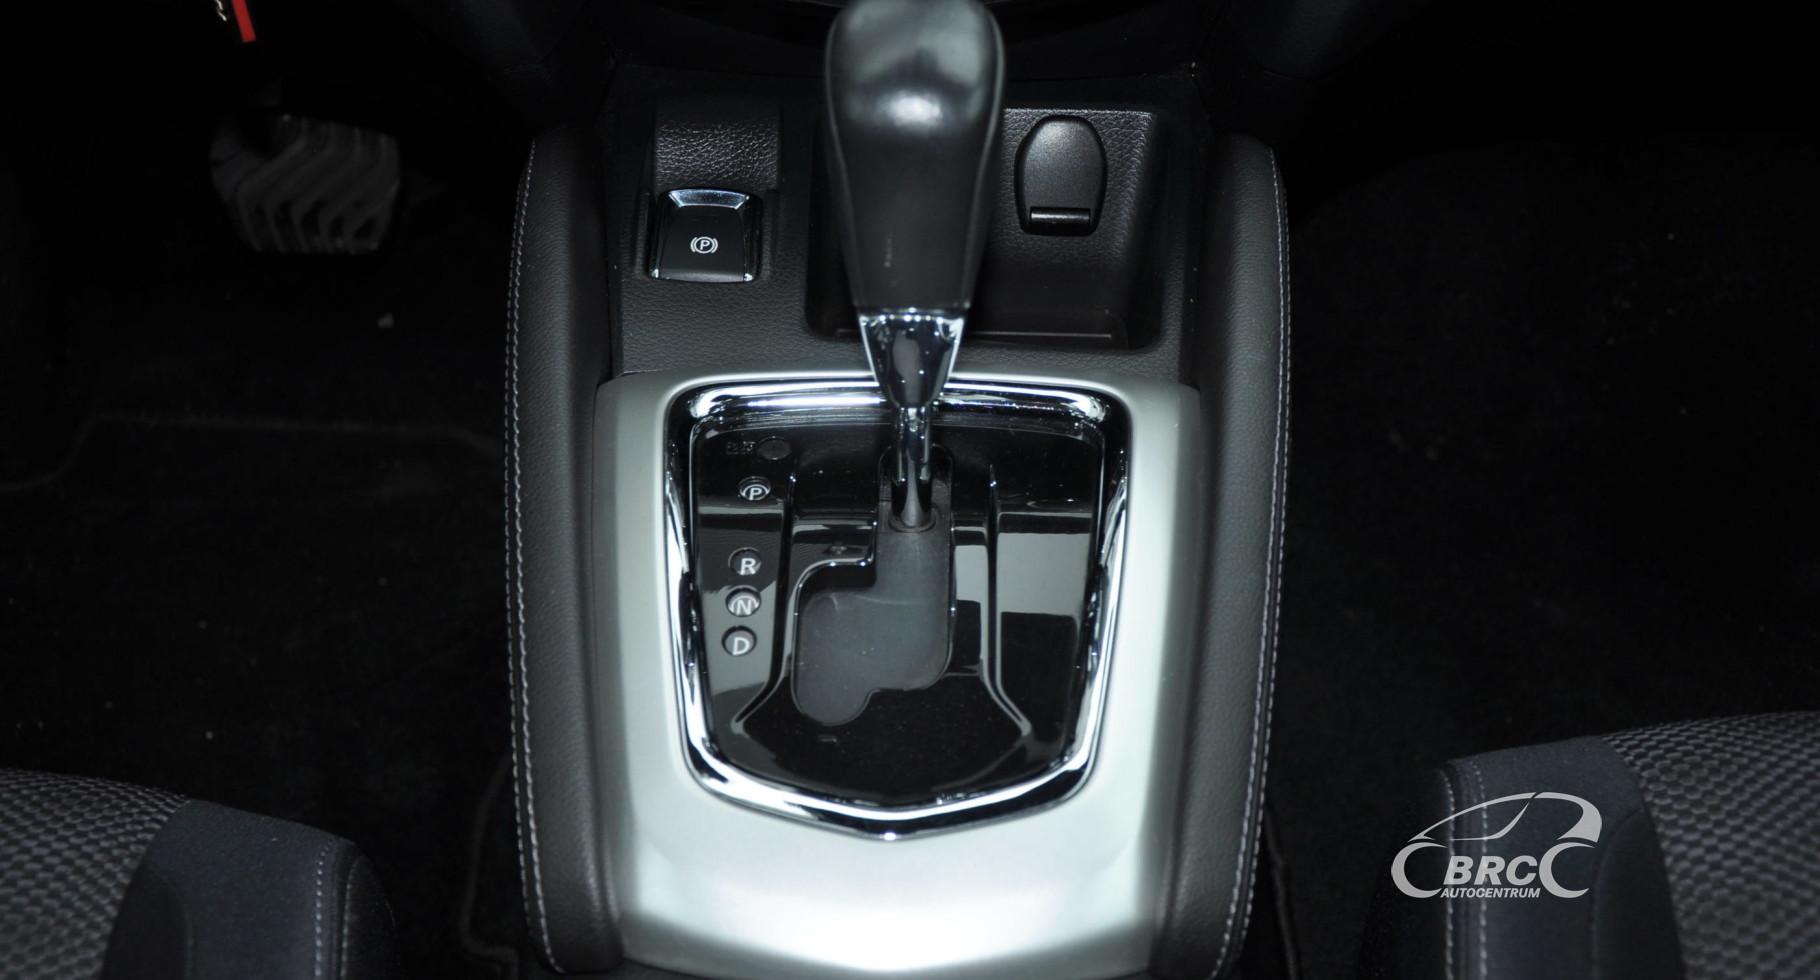 Nissan Qashqai 1.6 dCi Automatas